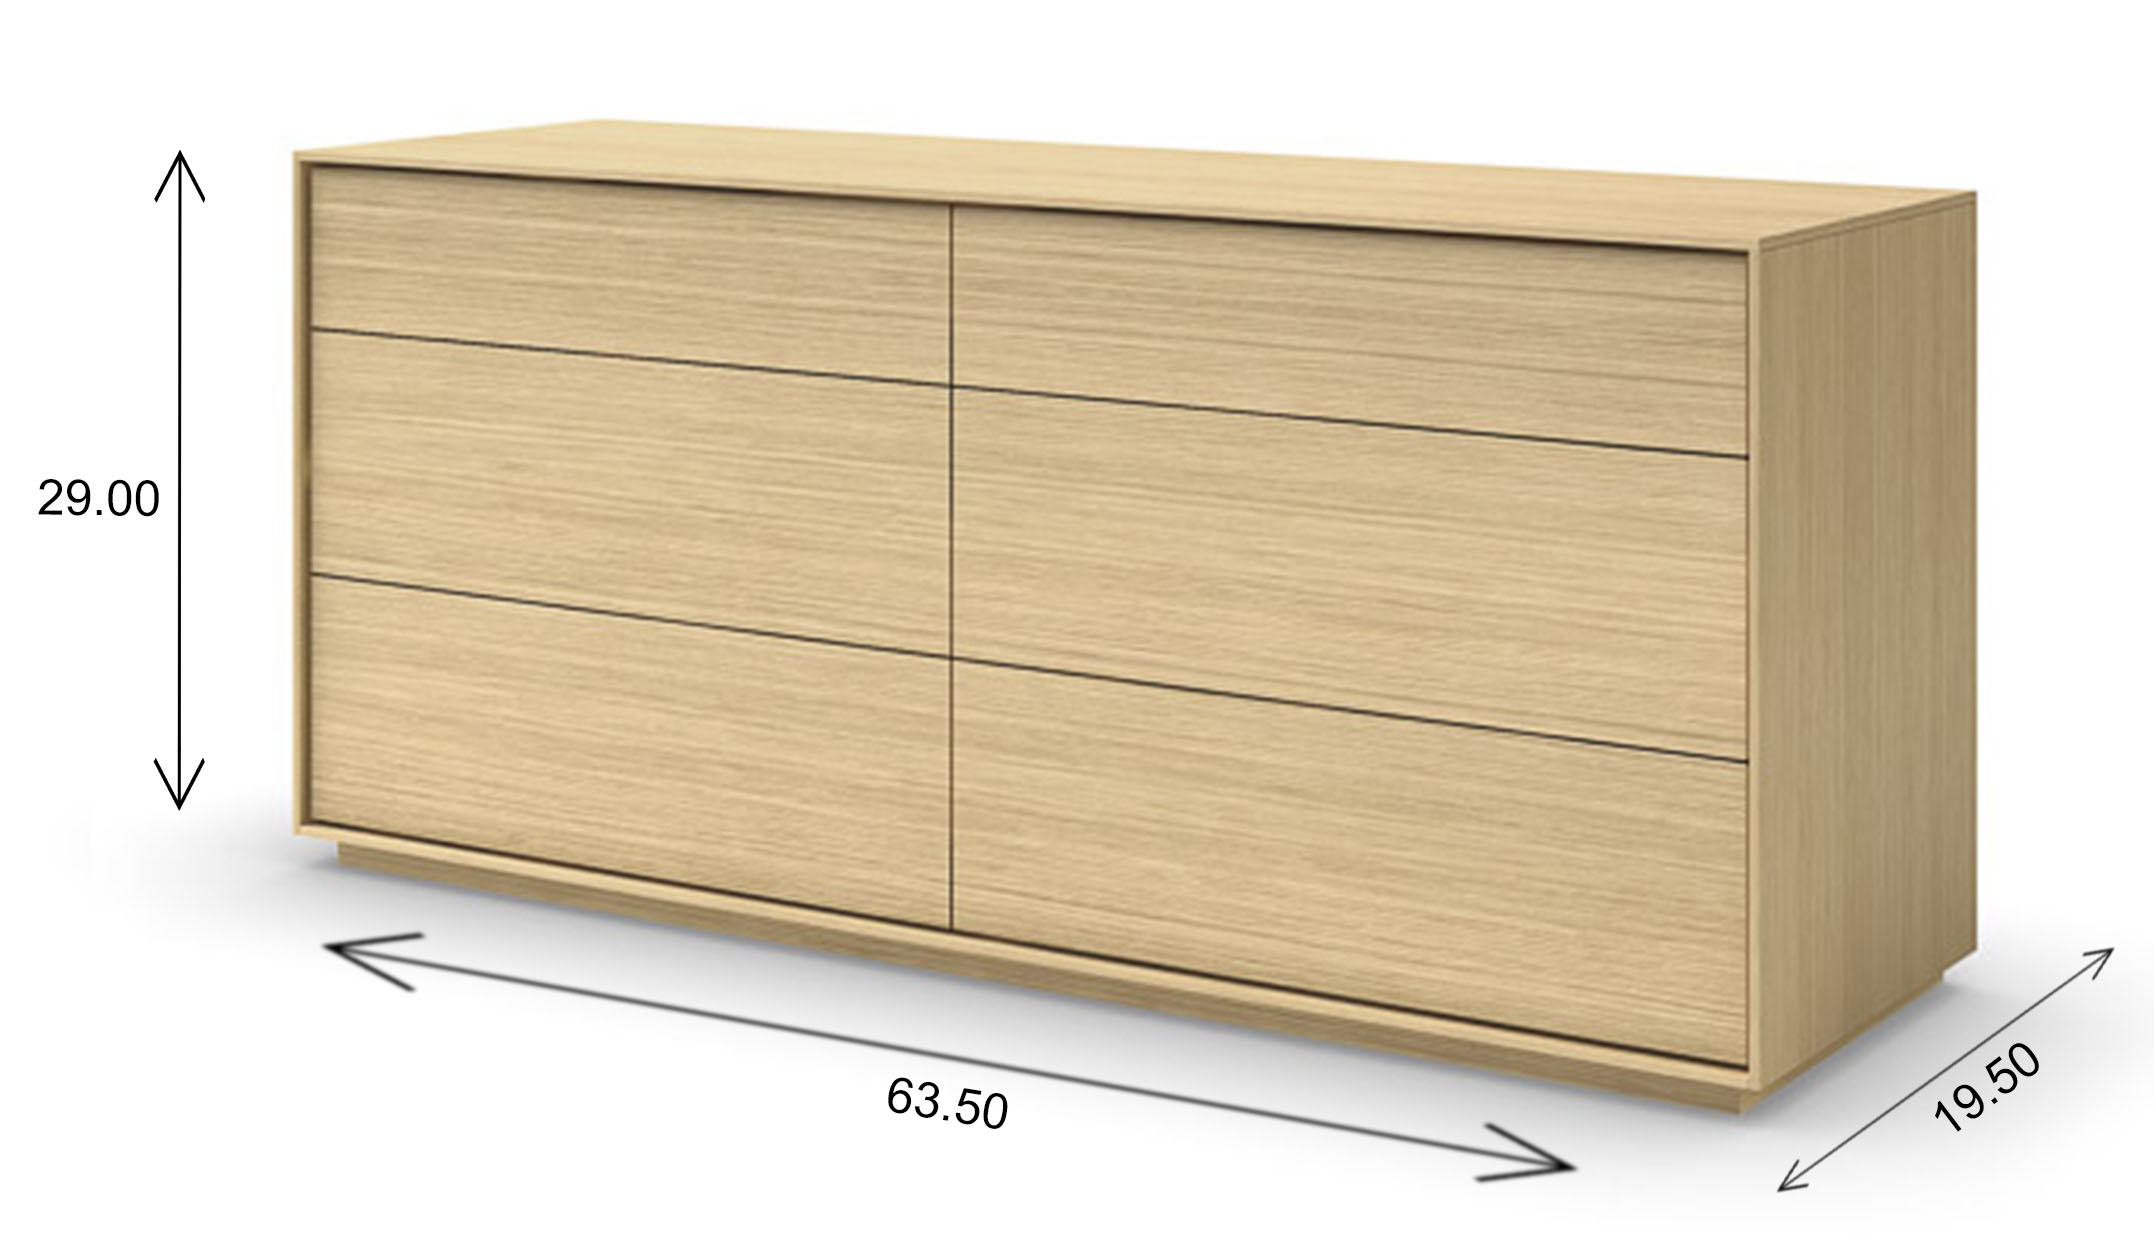 Mobican Azura Double Dresser Dimensions